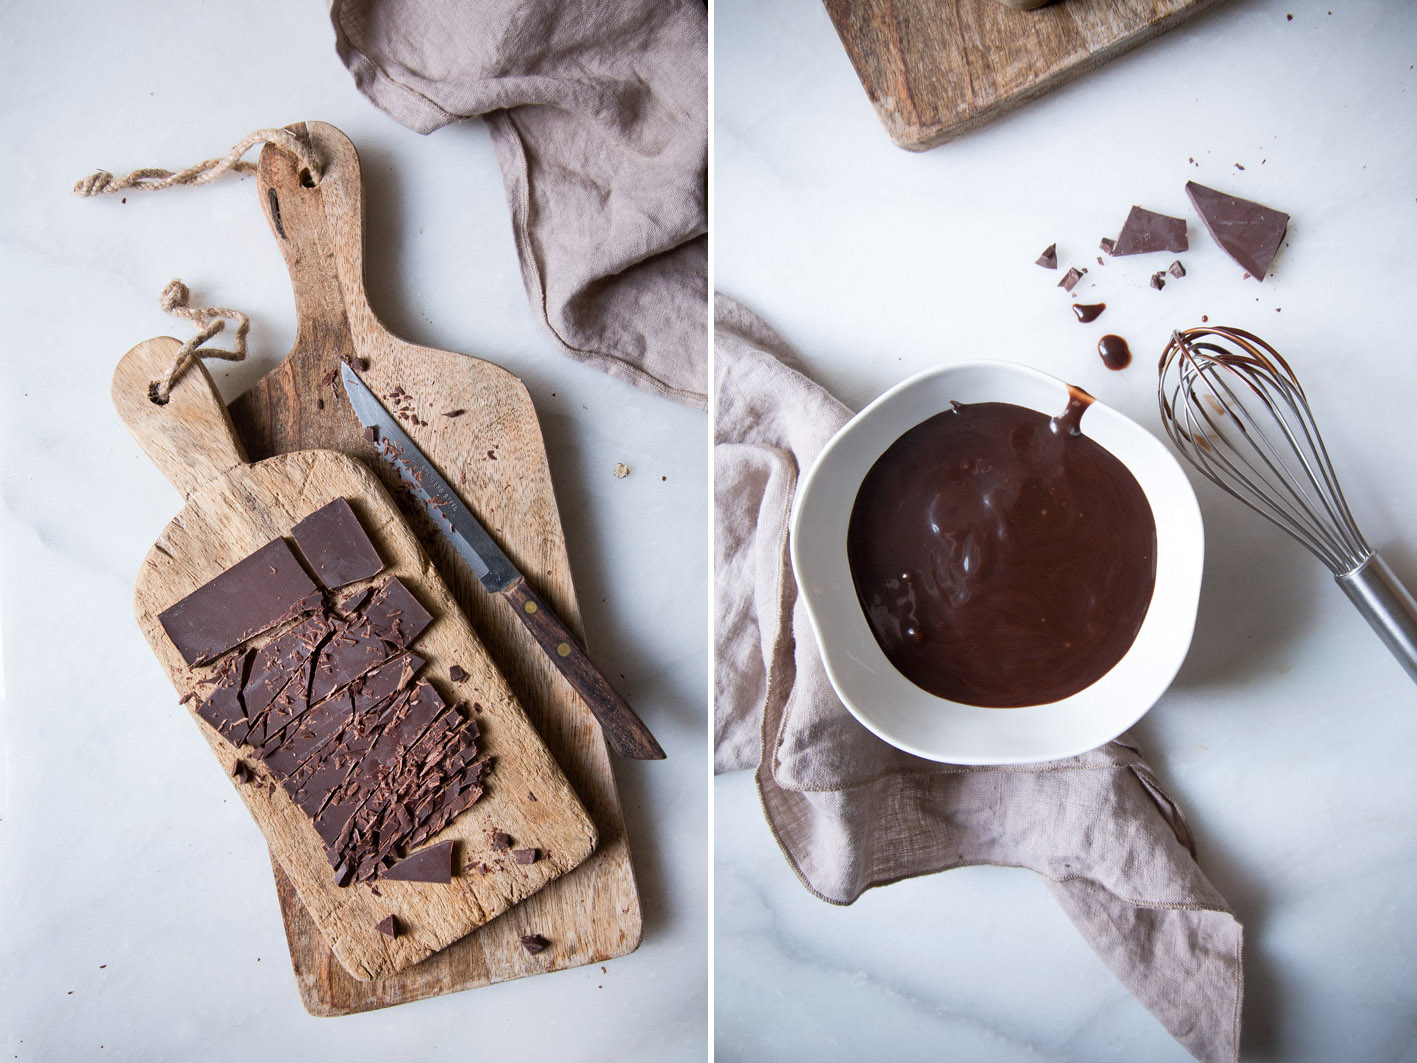 schokolade schmelzen